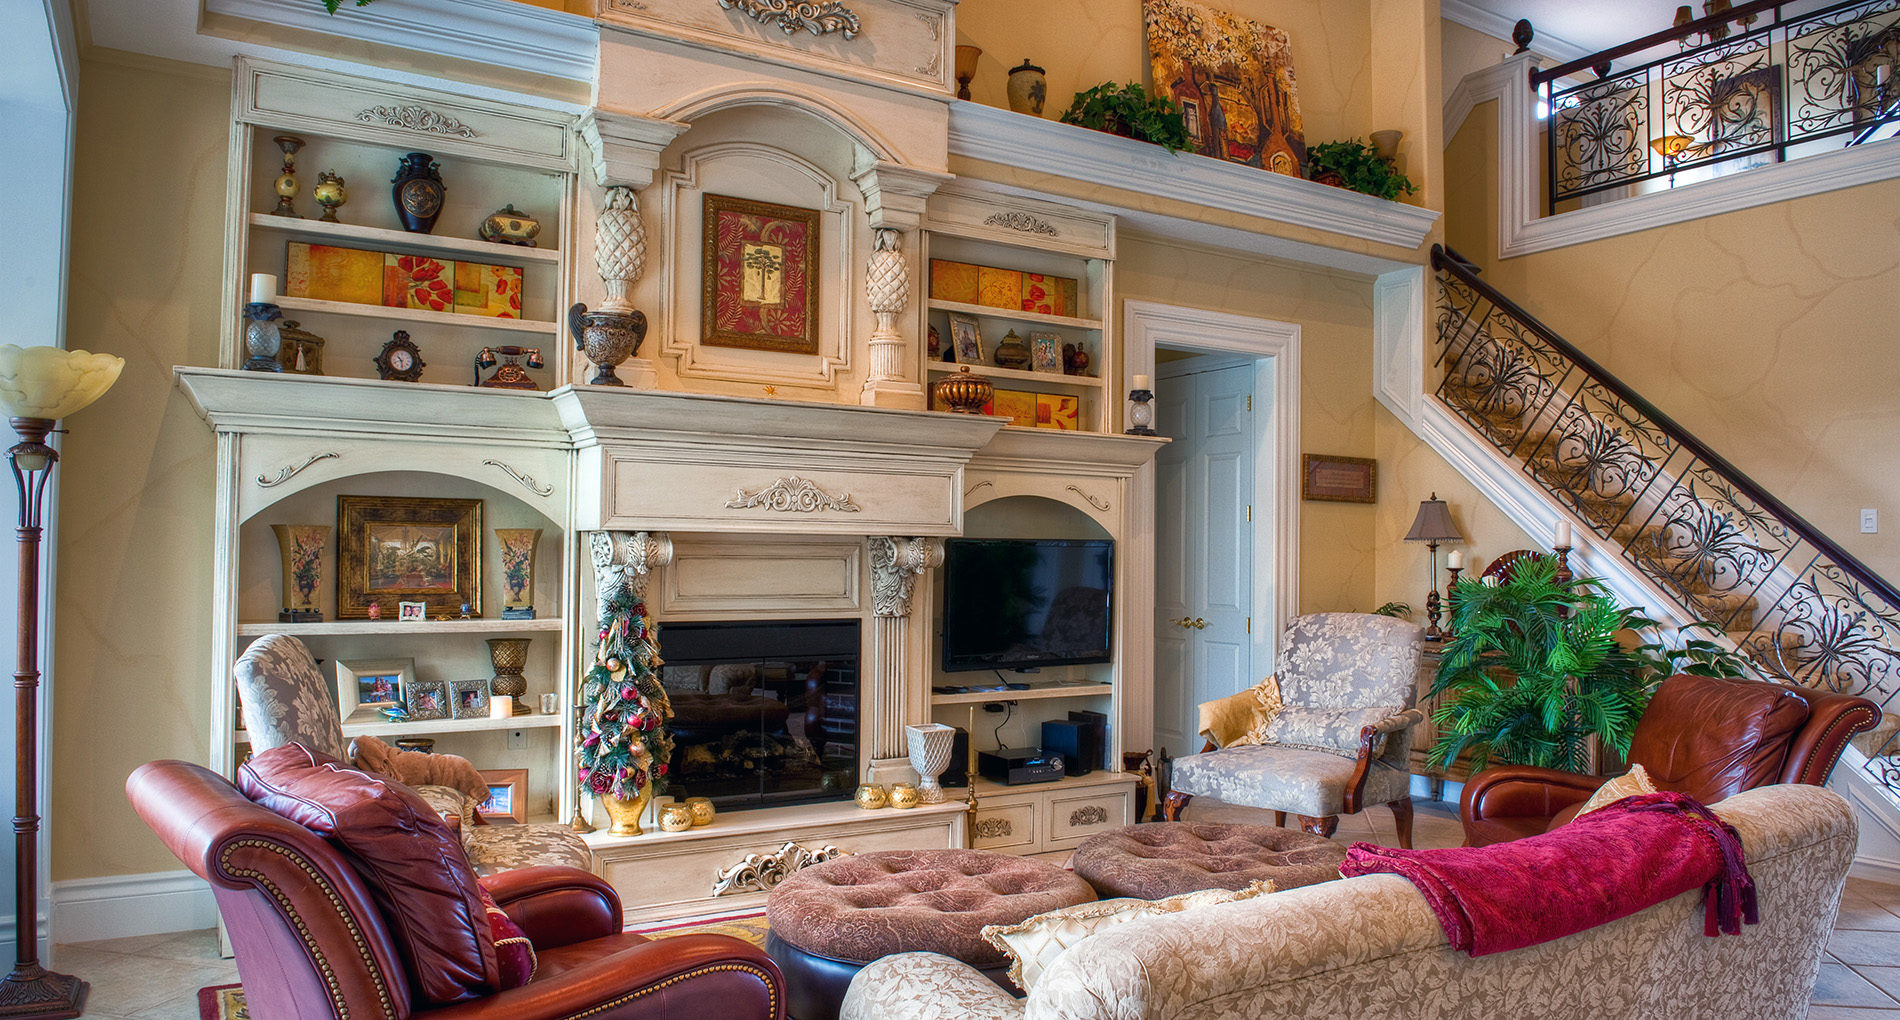 Home Remodel Bonitasprings Miromartraditional Slider